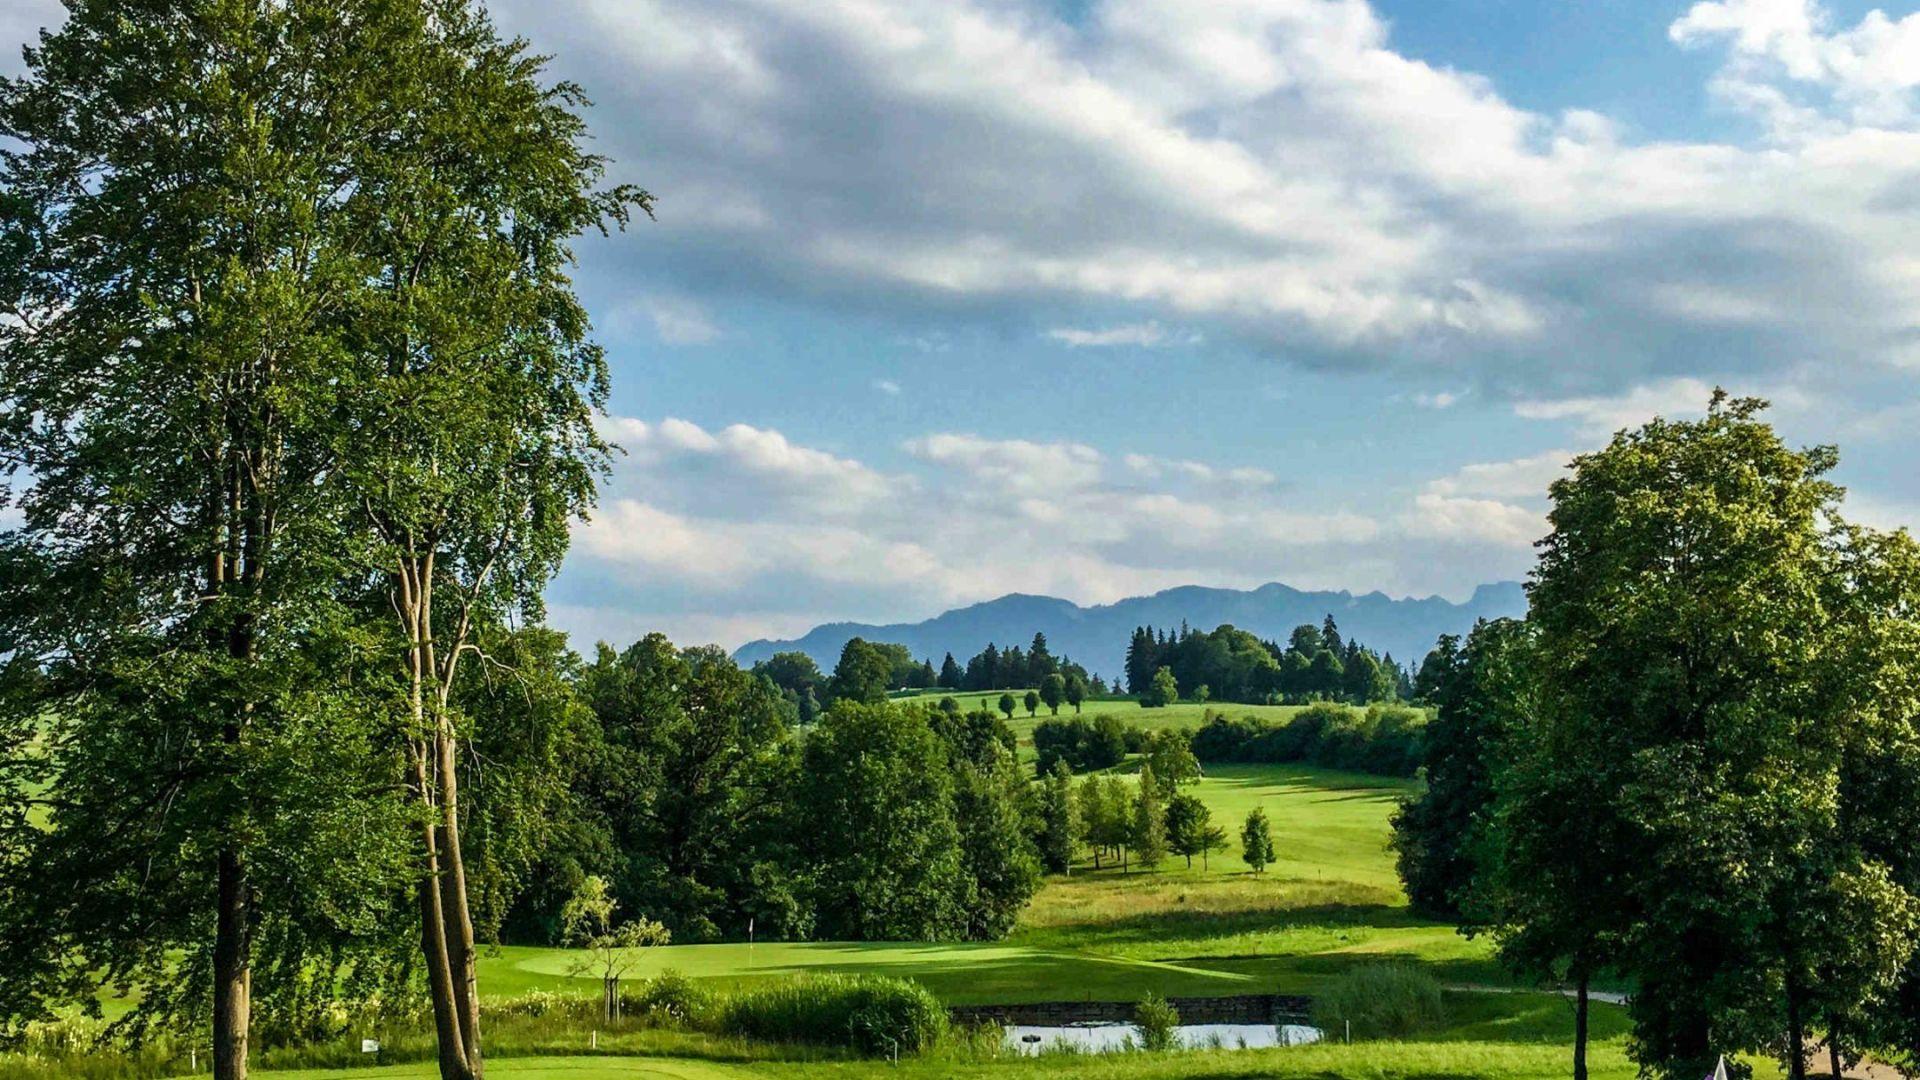 Golfplatz in Bad Tölz